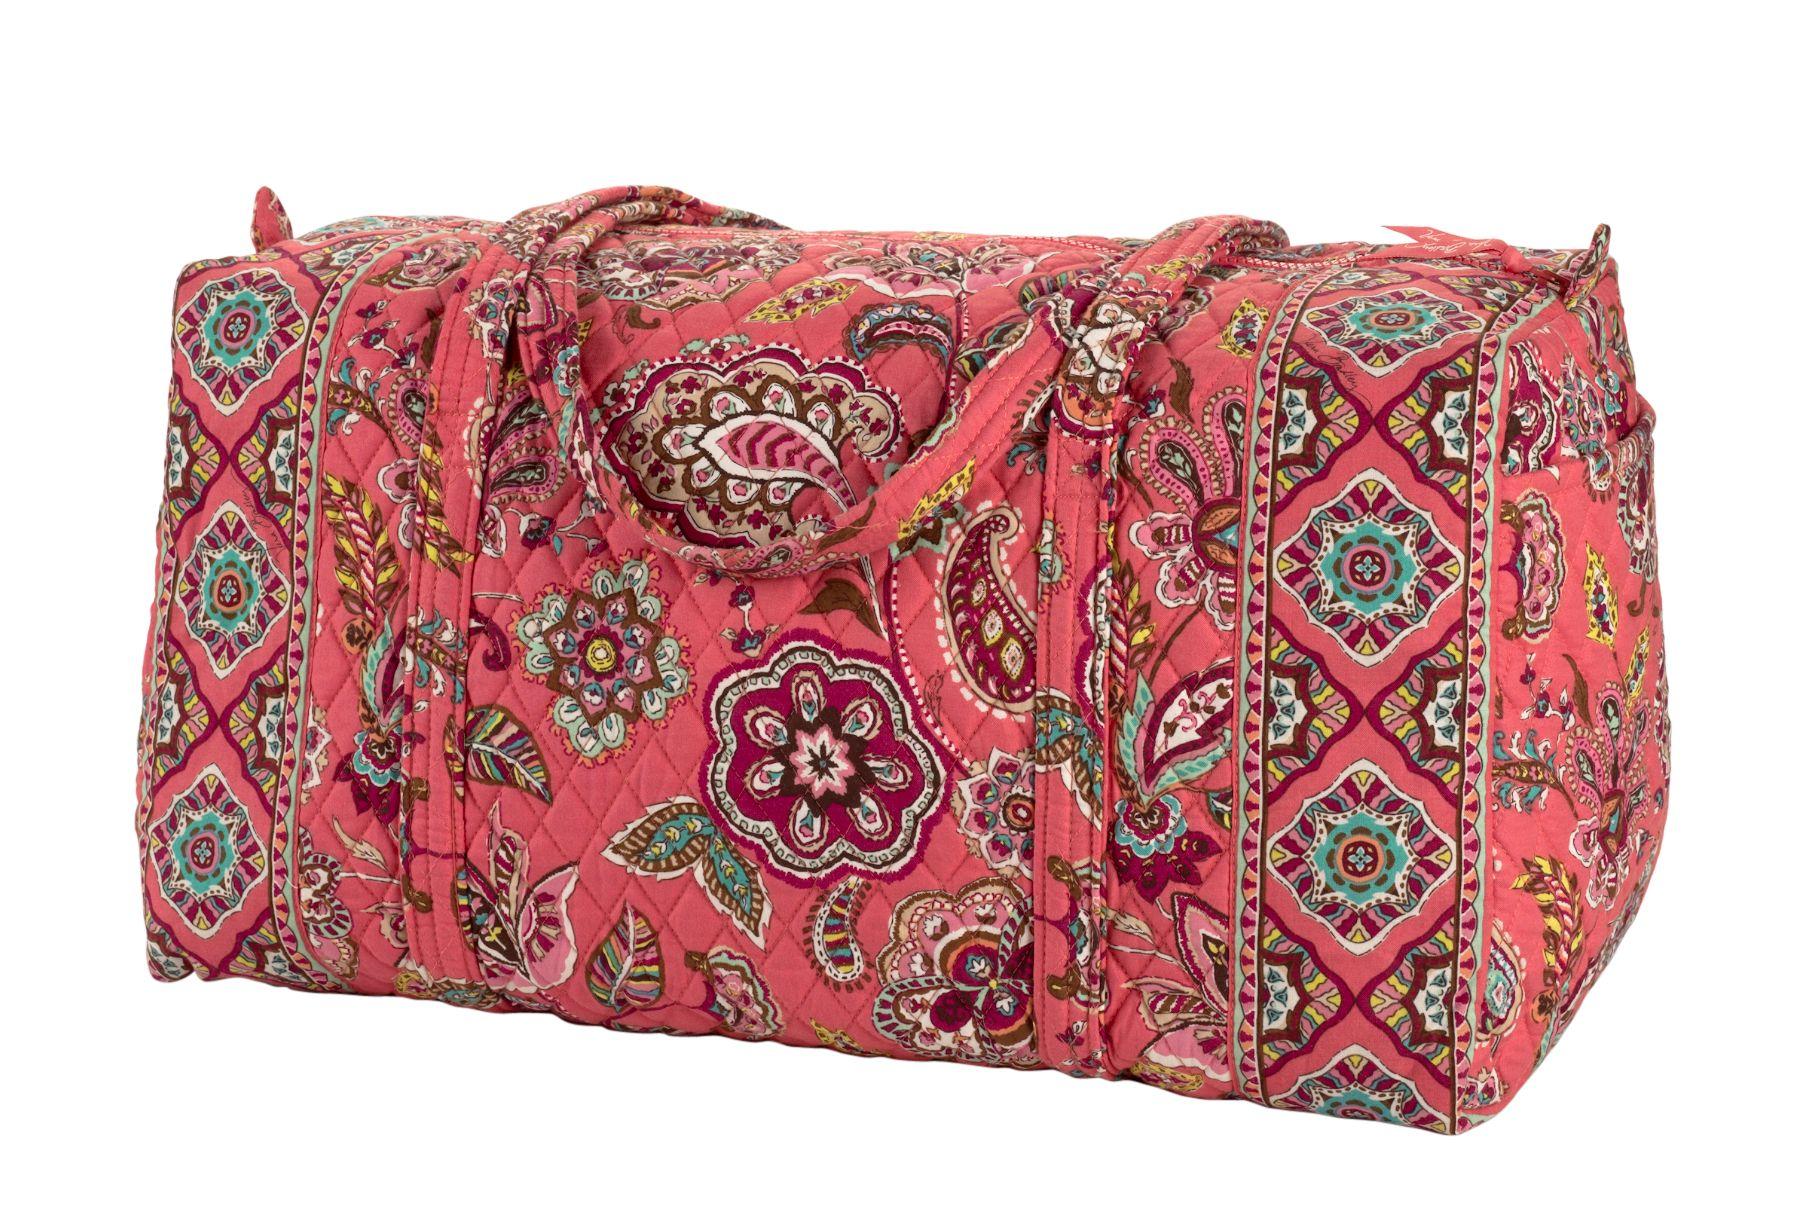 Vera Bradley Large Duffel Travel Bag   EBay